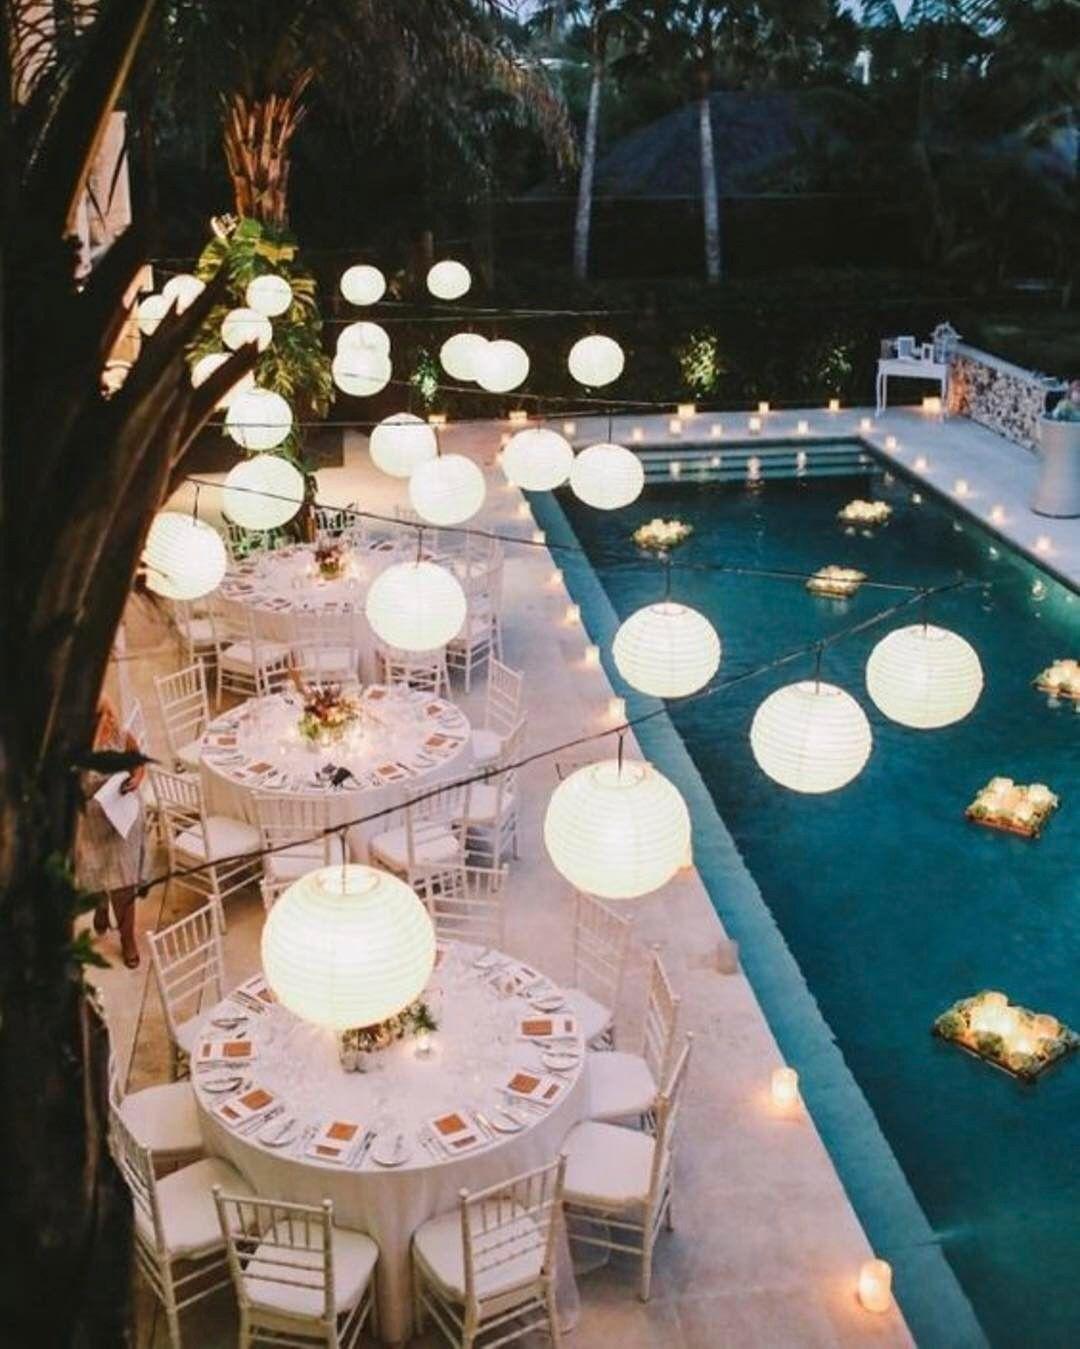 Outdoor Wedding Reception Ideas For Summer: Dinner, Hanging Lights, Pool